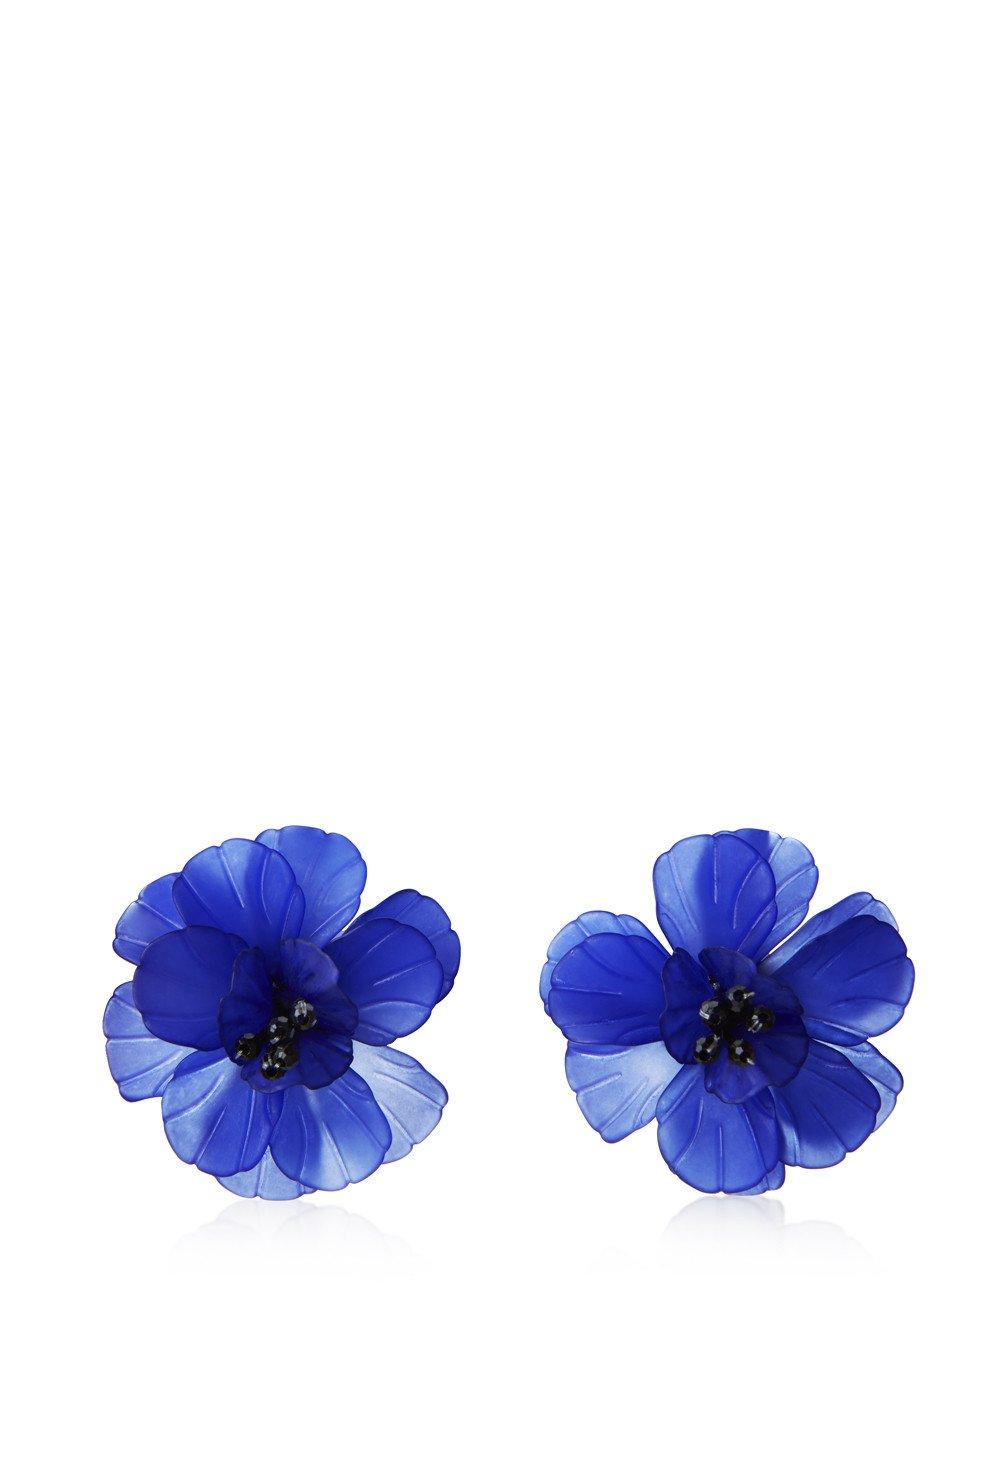 Ken-Samudio-Blue-Flower-Earrings.jpg